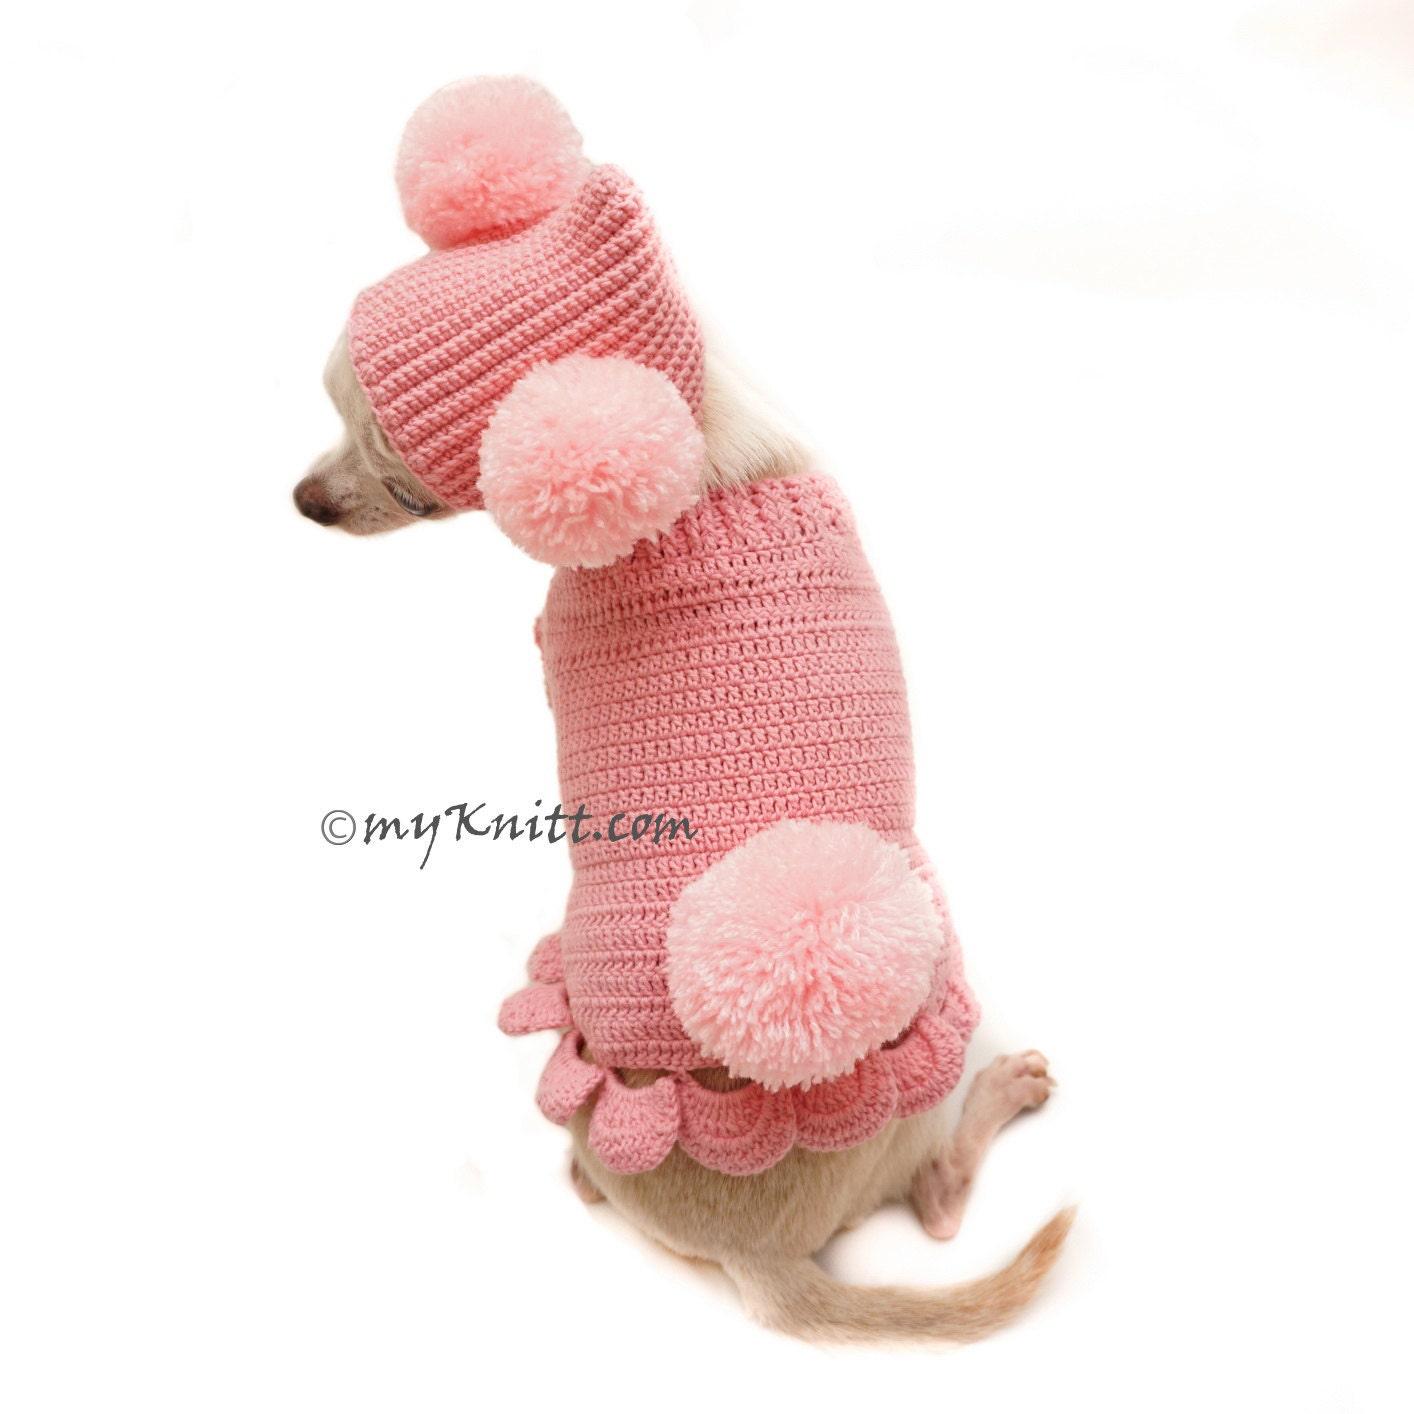 Myknitt Handmade Dog Sweater Dog Clothes Dog Clothing por myknitt